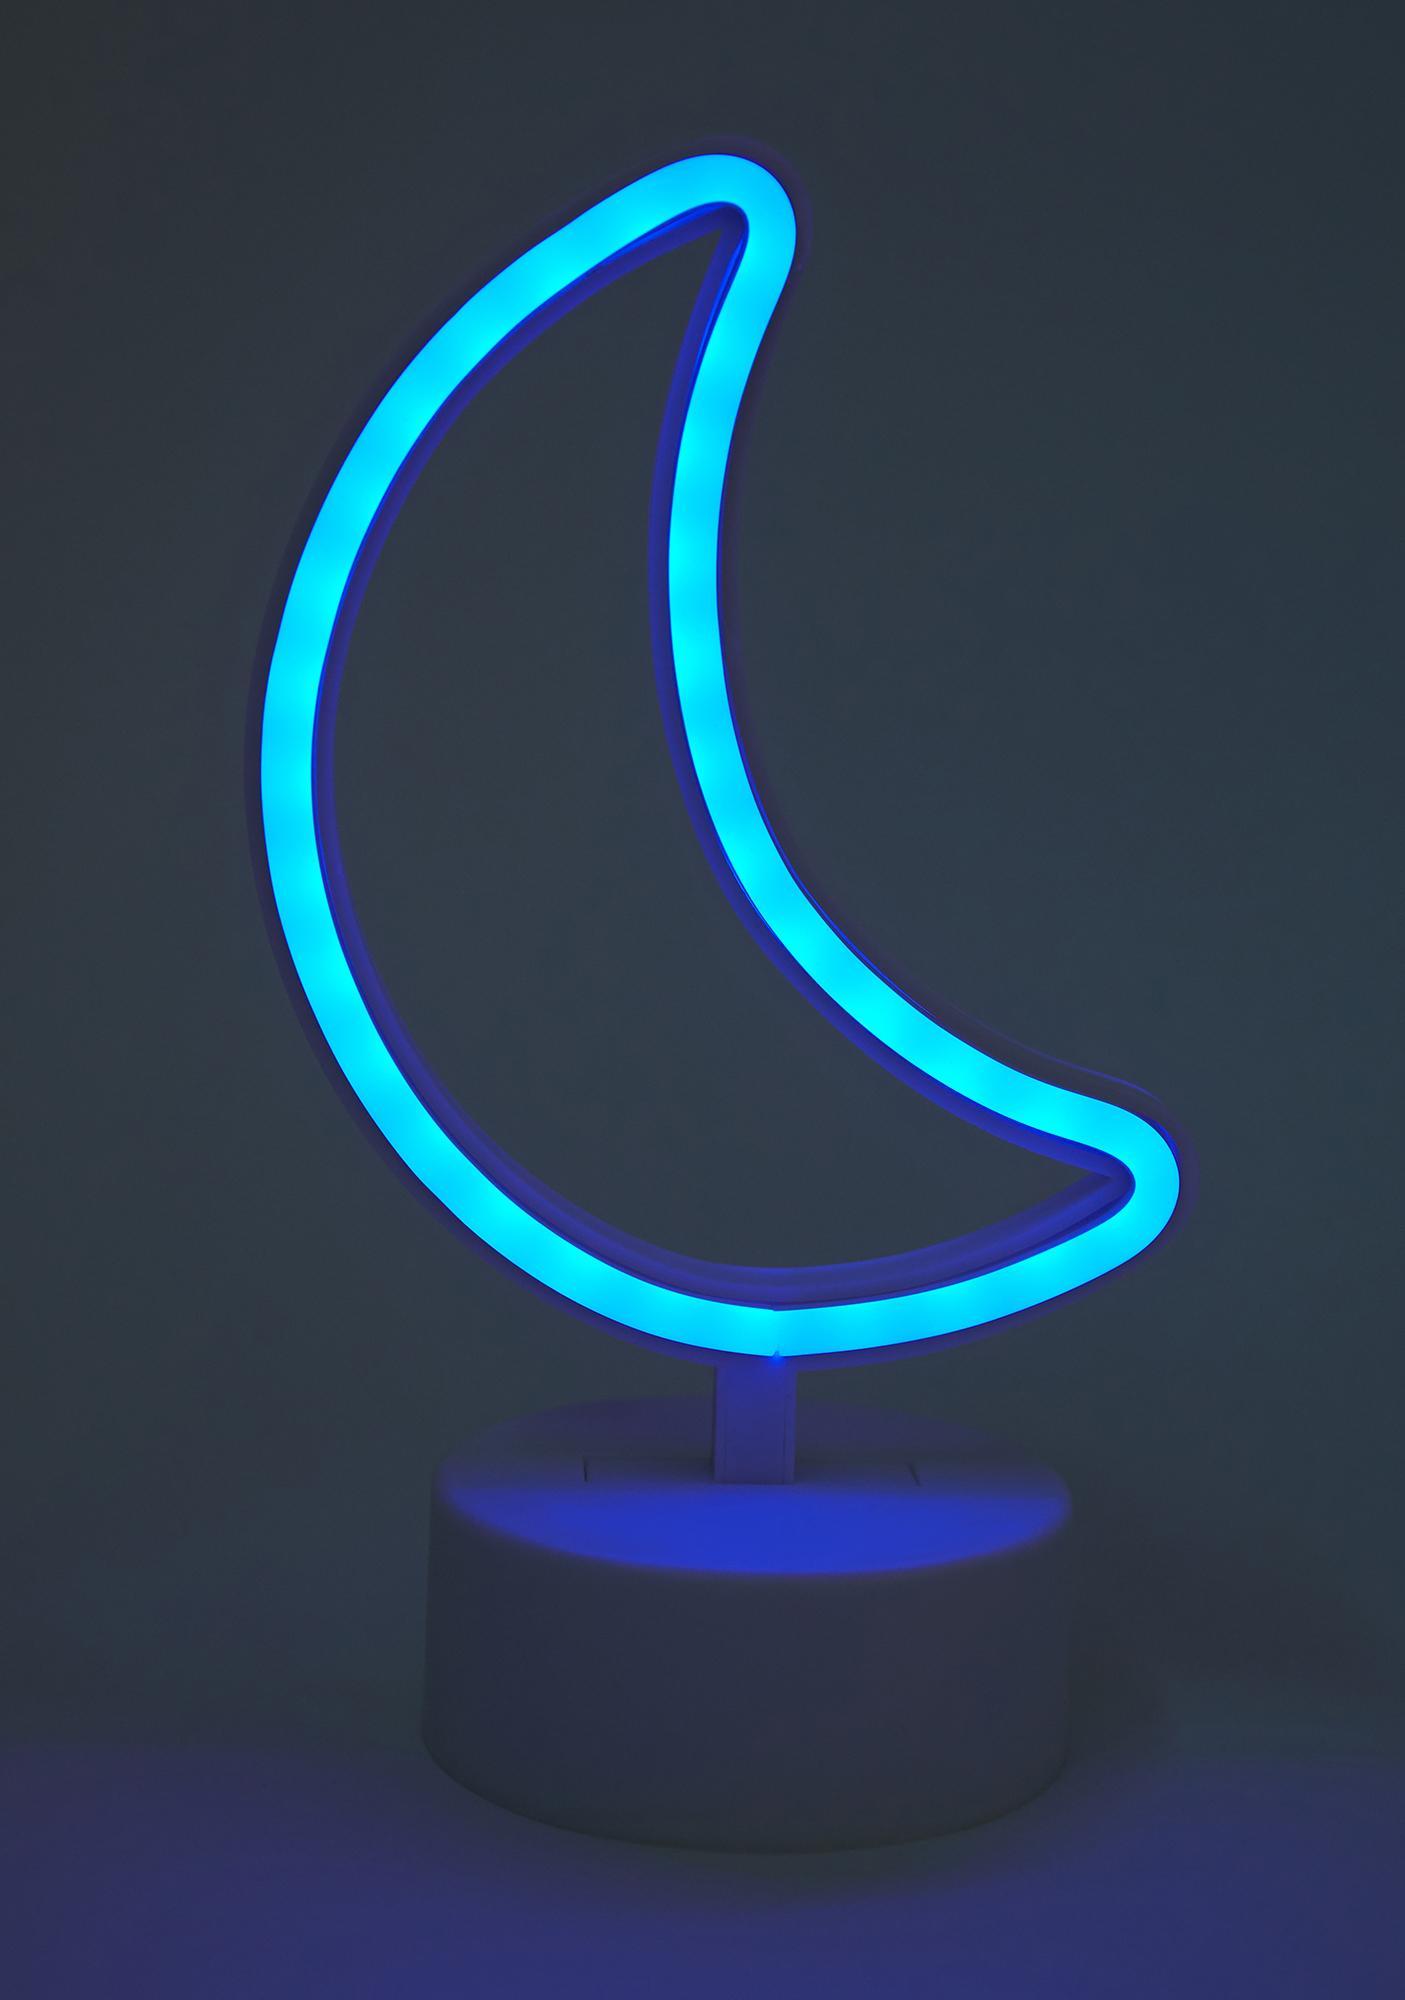 Amped & Co Moon Mini LED Light